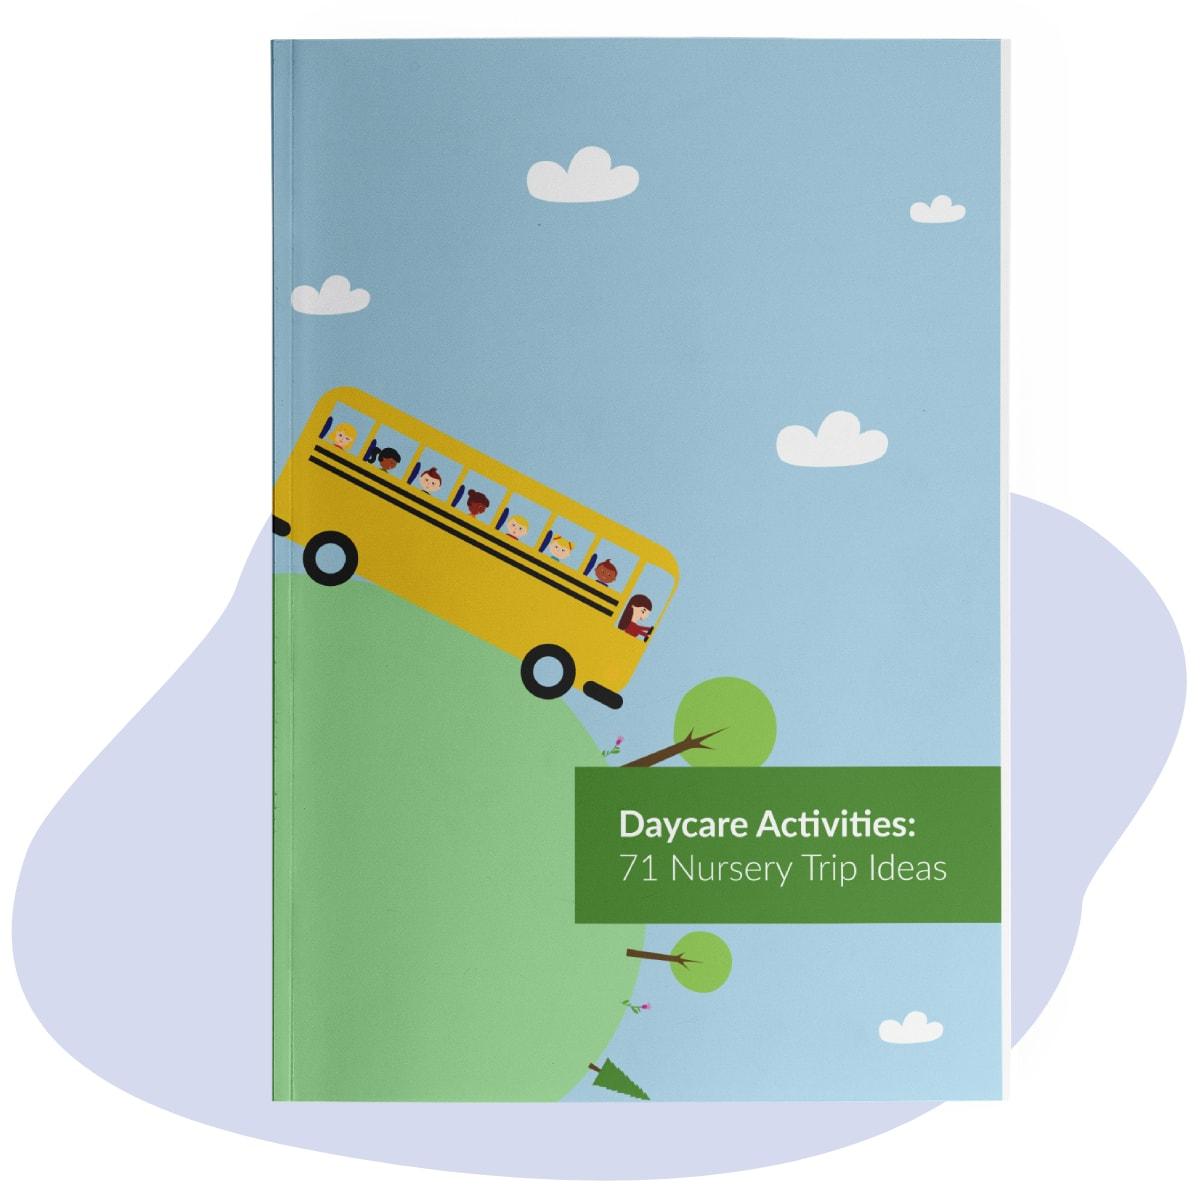 Daycare Activities: 71 Nursery Trip Ideas